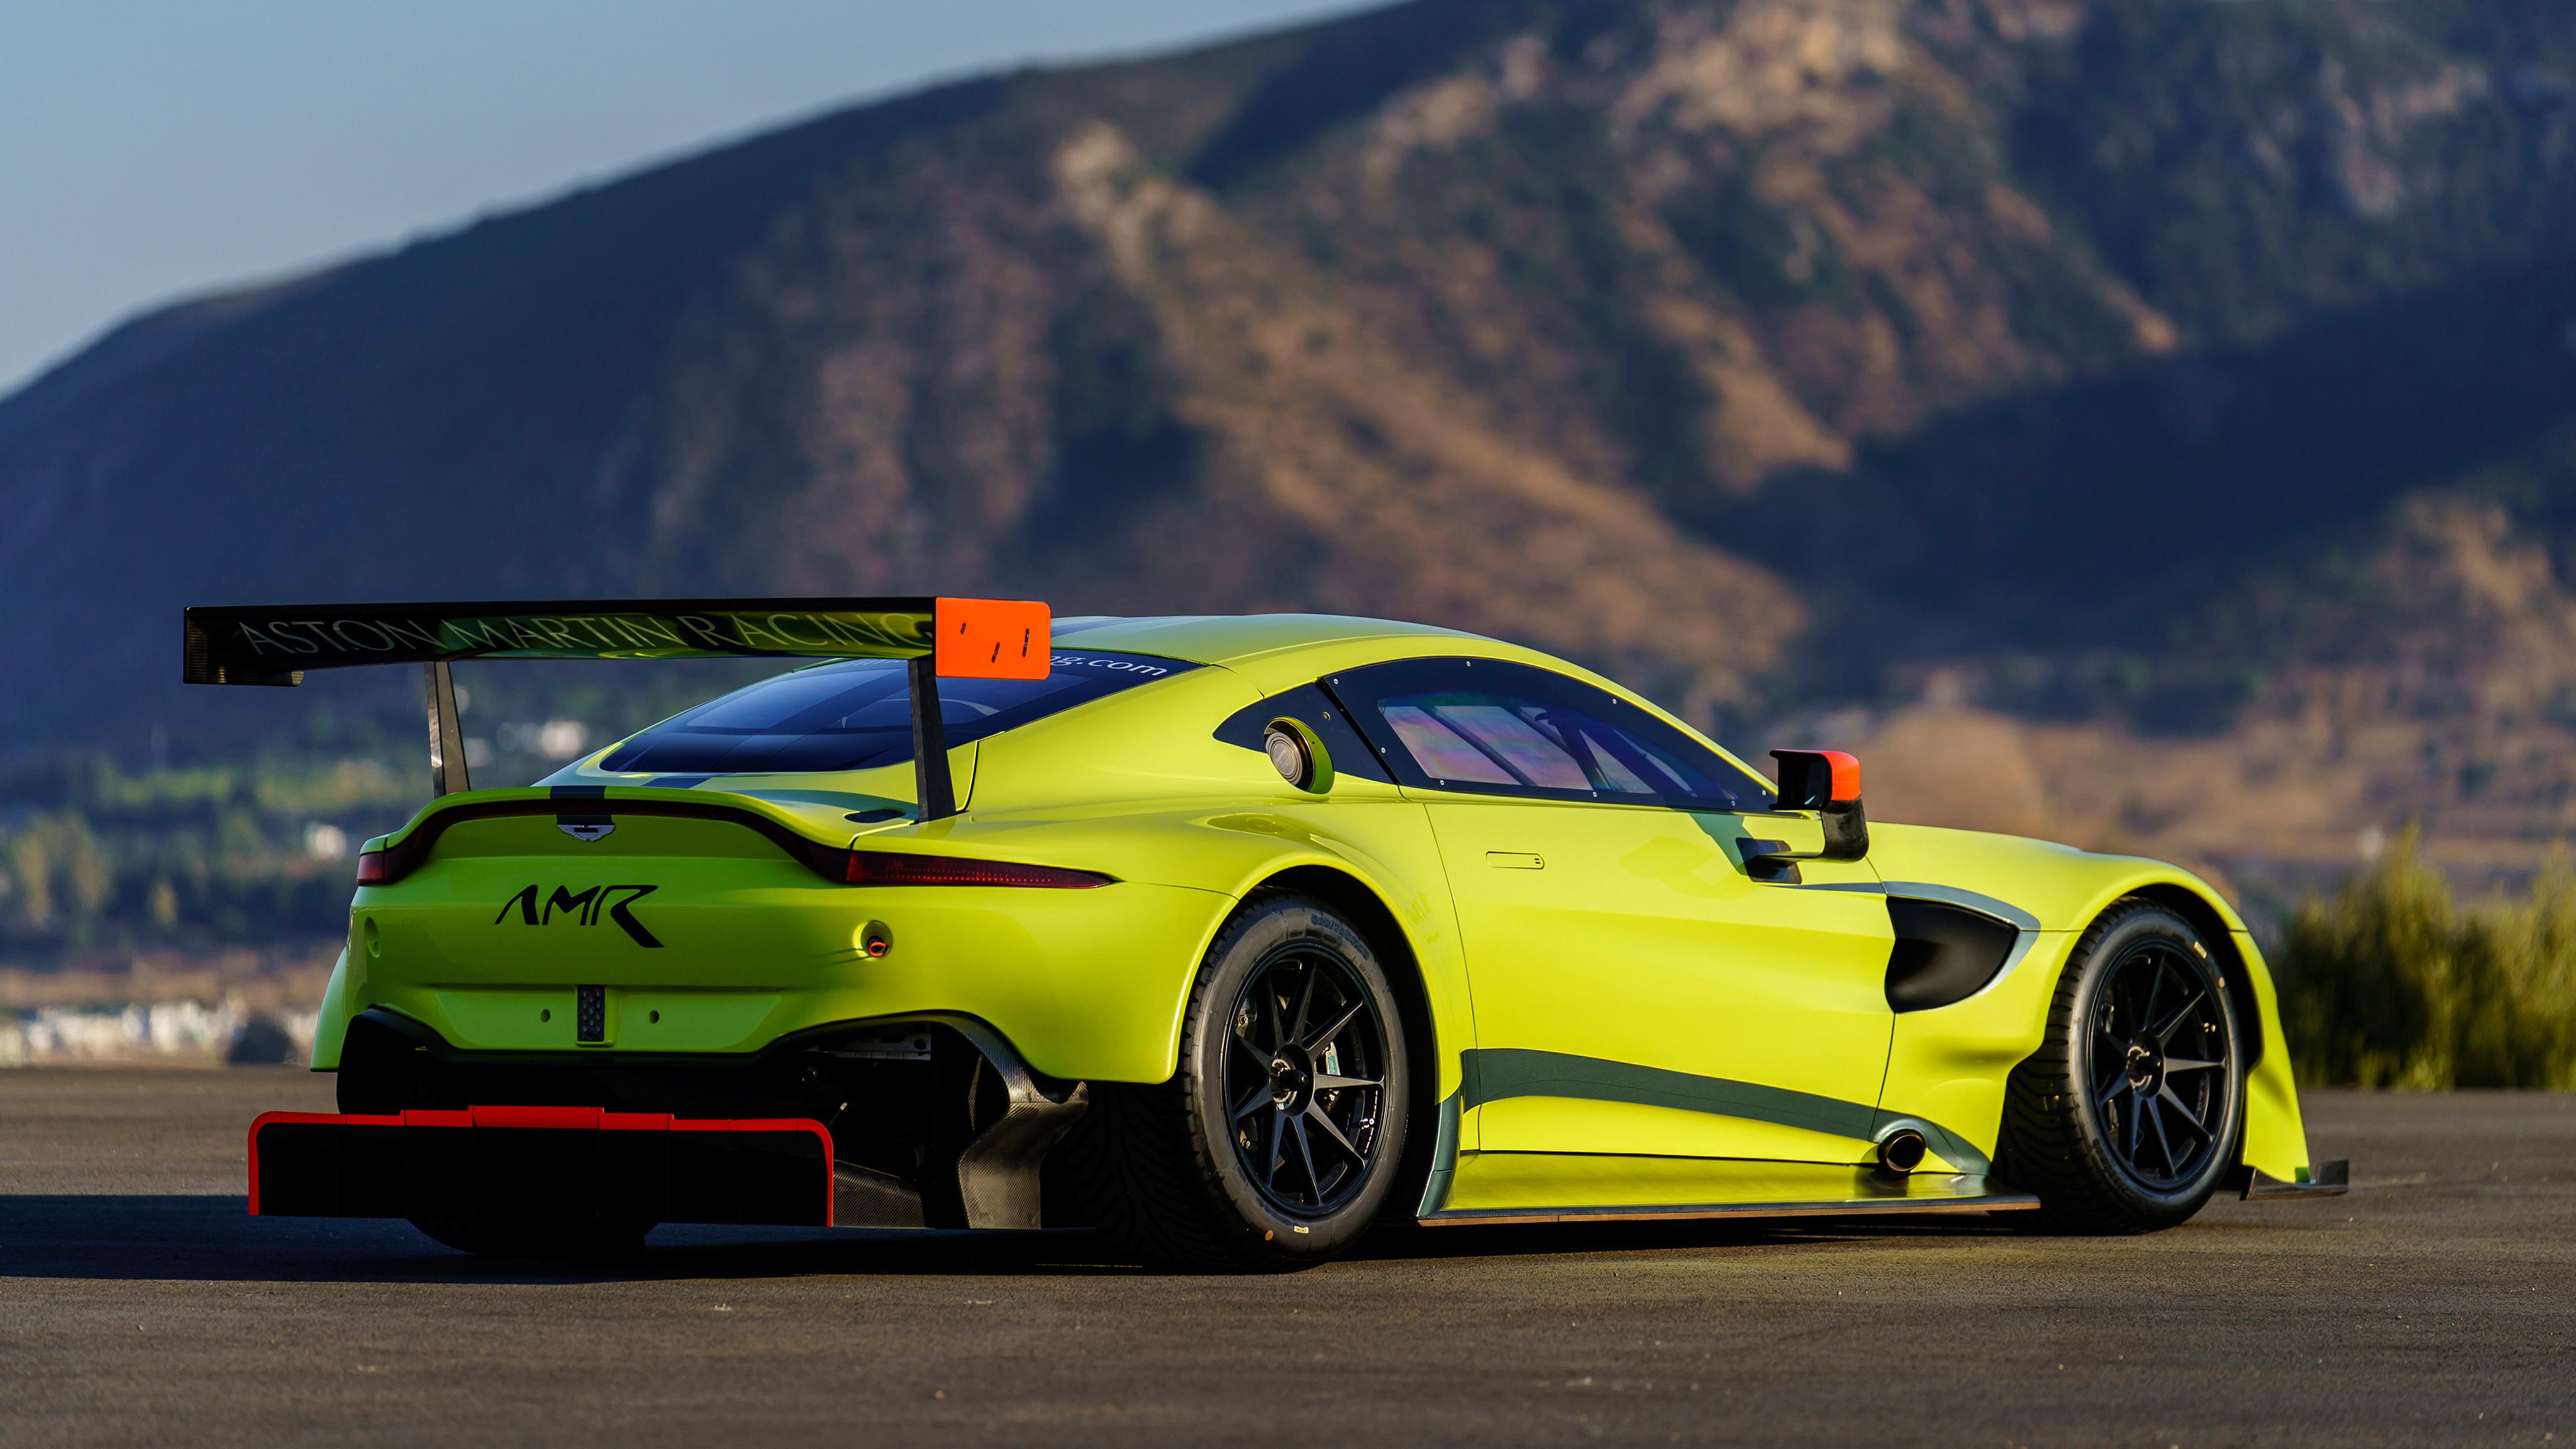 2018 Aston Martin Vantage GTE 4K 7 Wallpaper HD Car